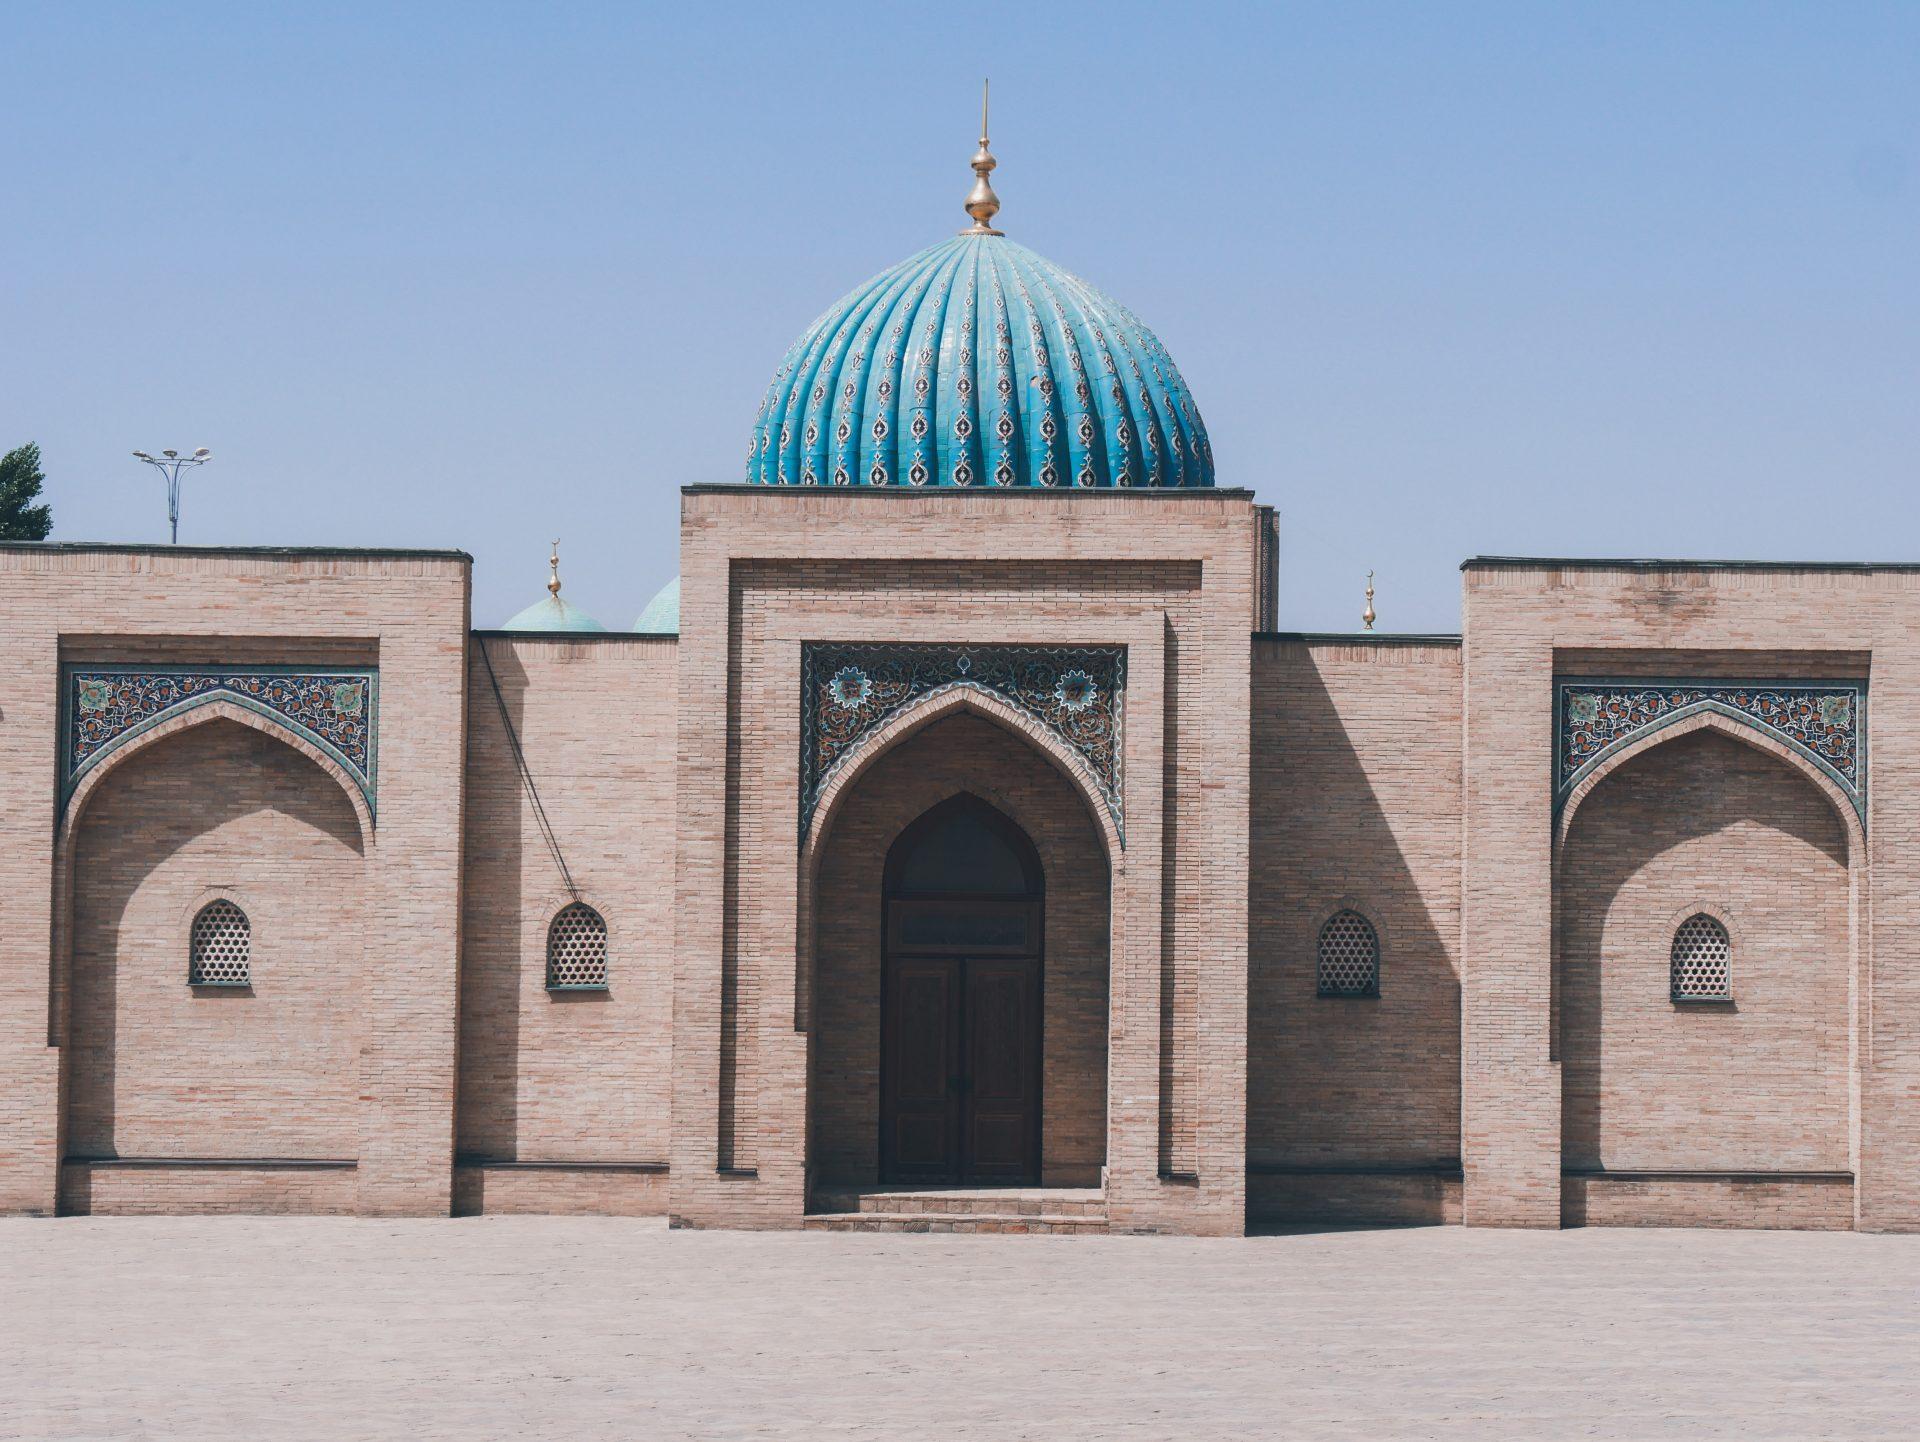 Tachkent - Place Khast Imam